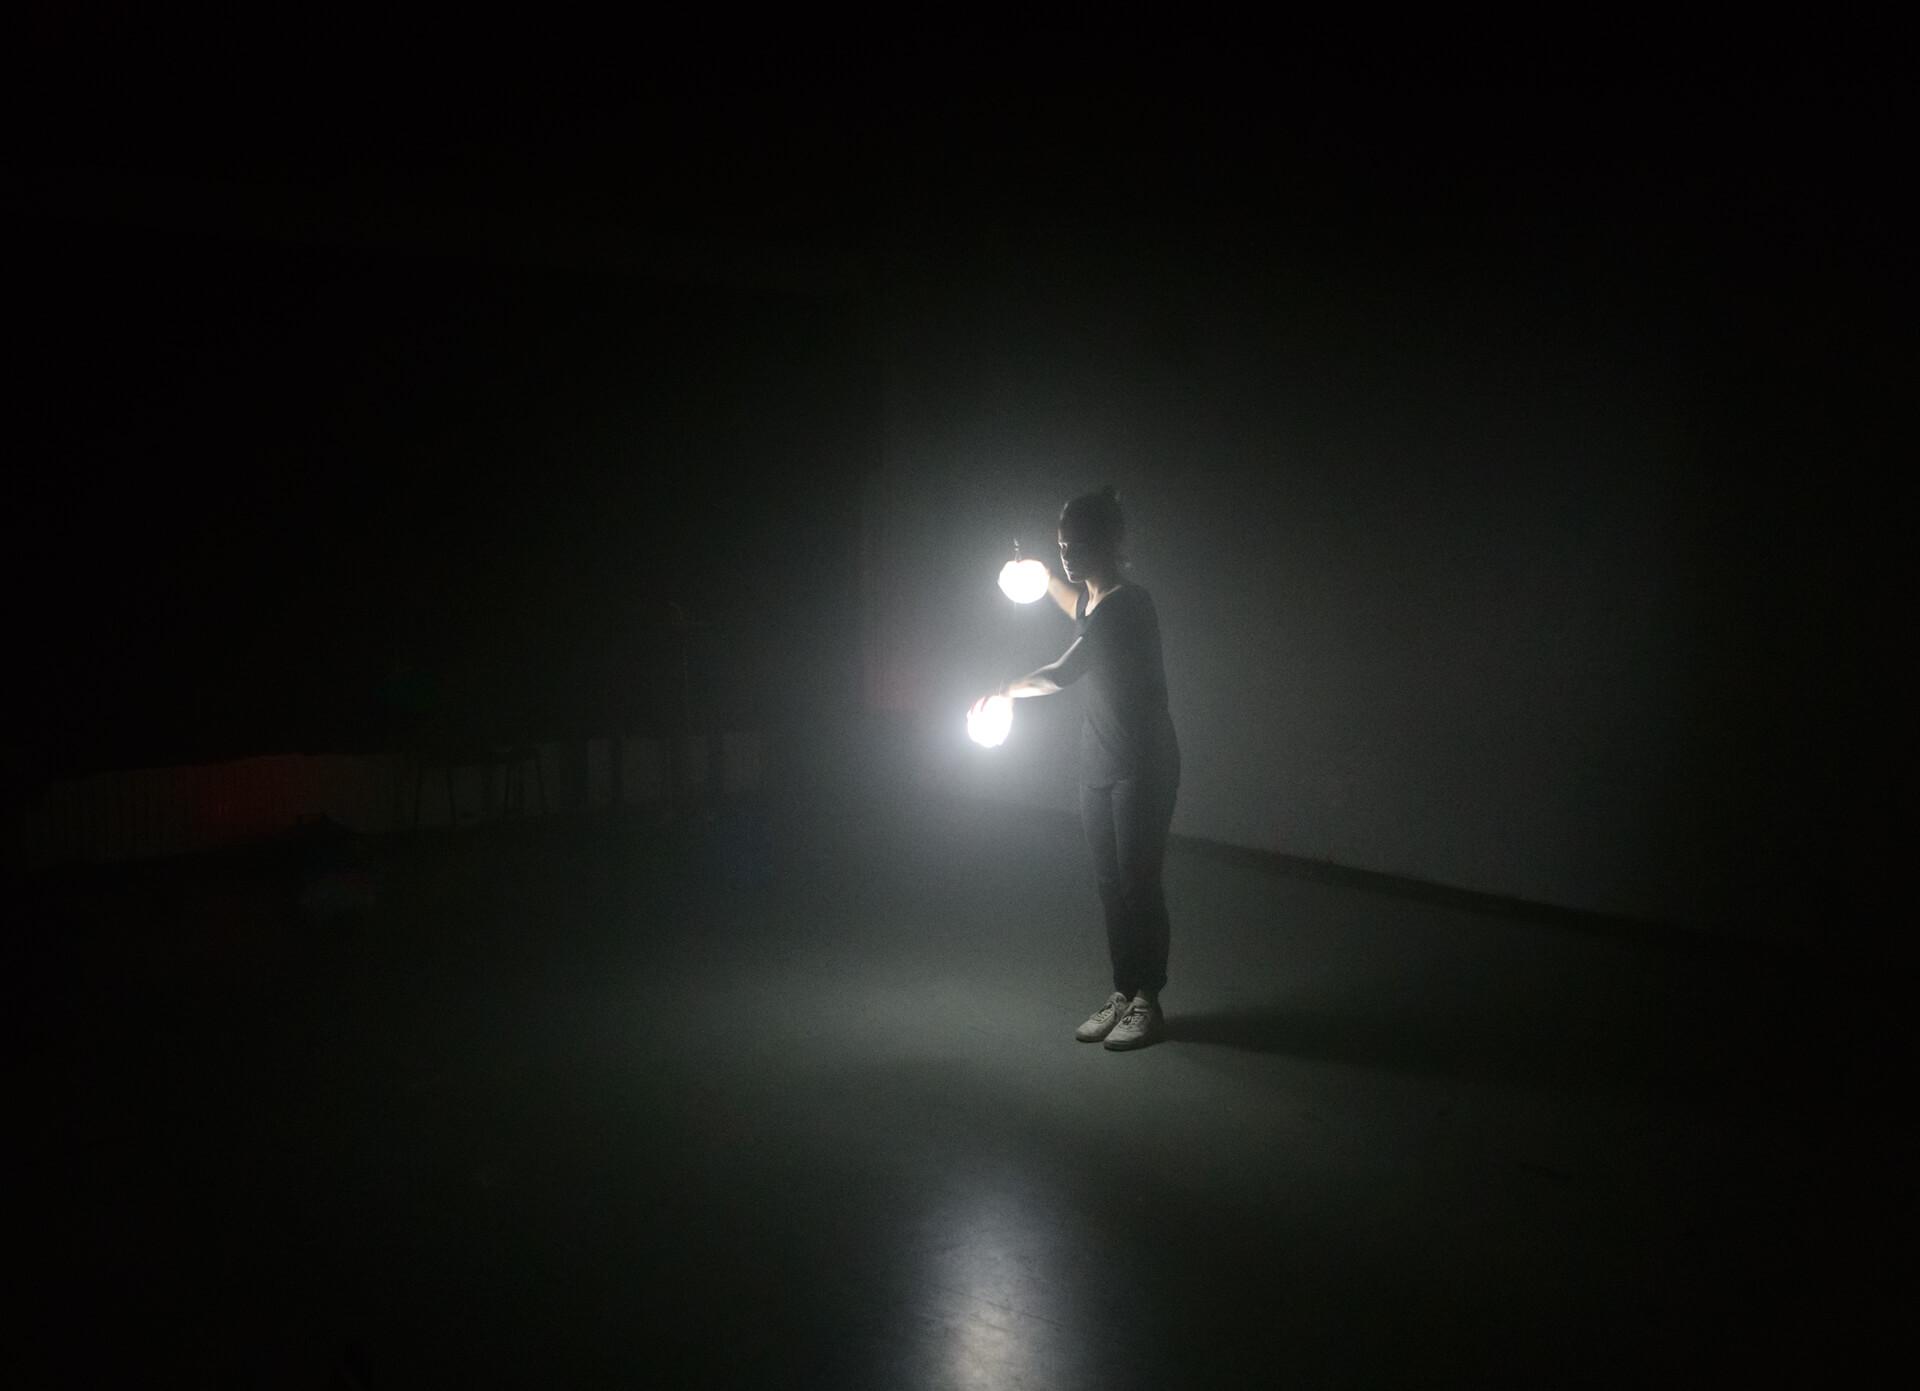 <MUTEK.JP 2019>の第一弾ラインアップにKode9&森本晃司、Tim Hecker、真鍋大度、中山晃子らが発表 music190926-mutek